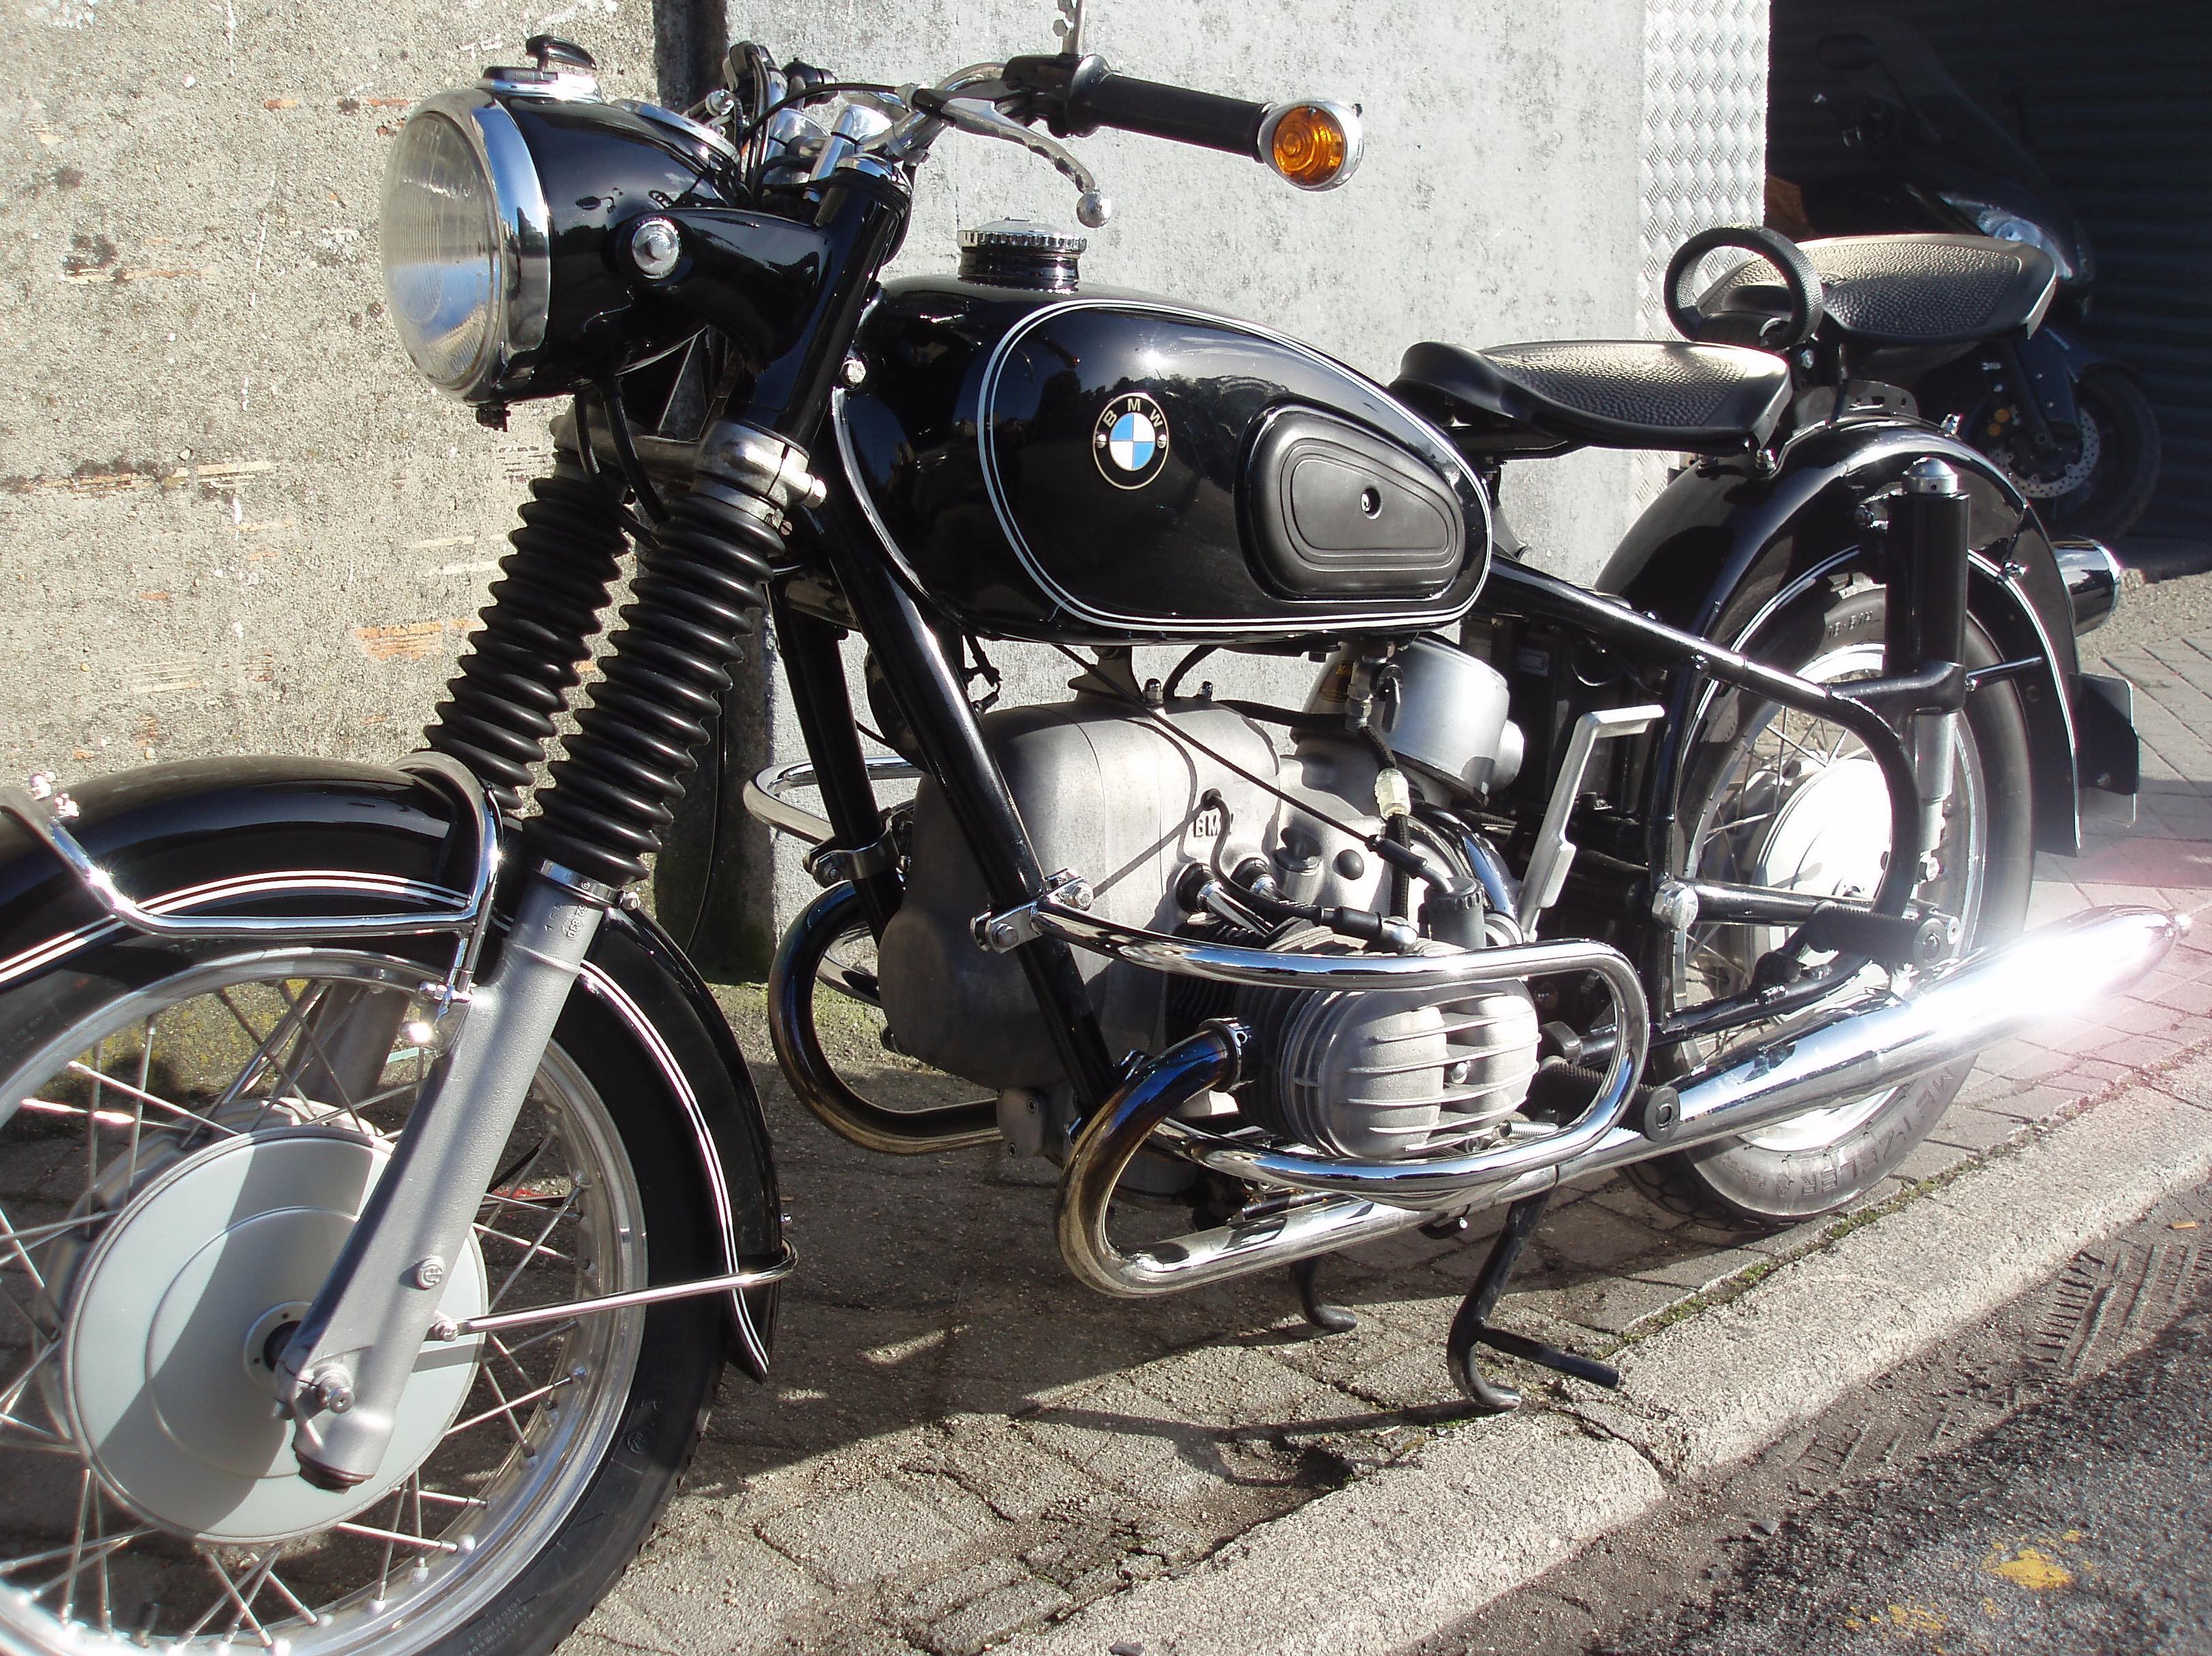 Foto 19 de Motos en Vigo | Moto 2